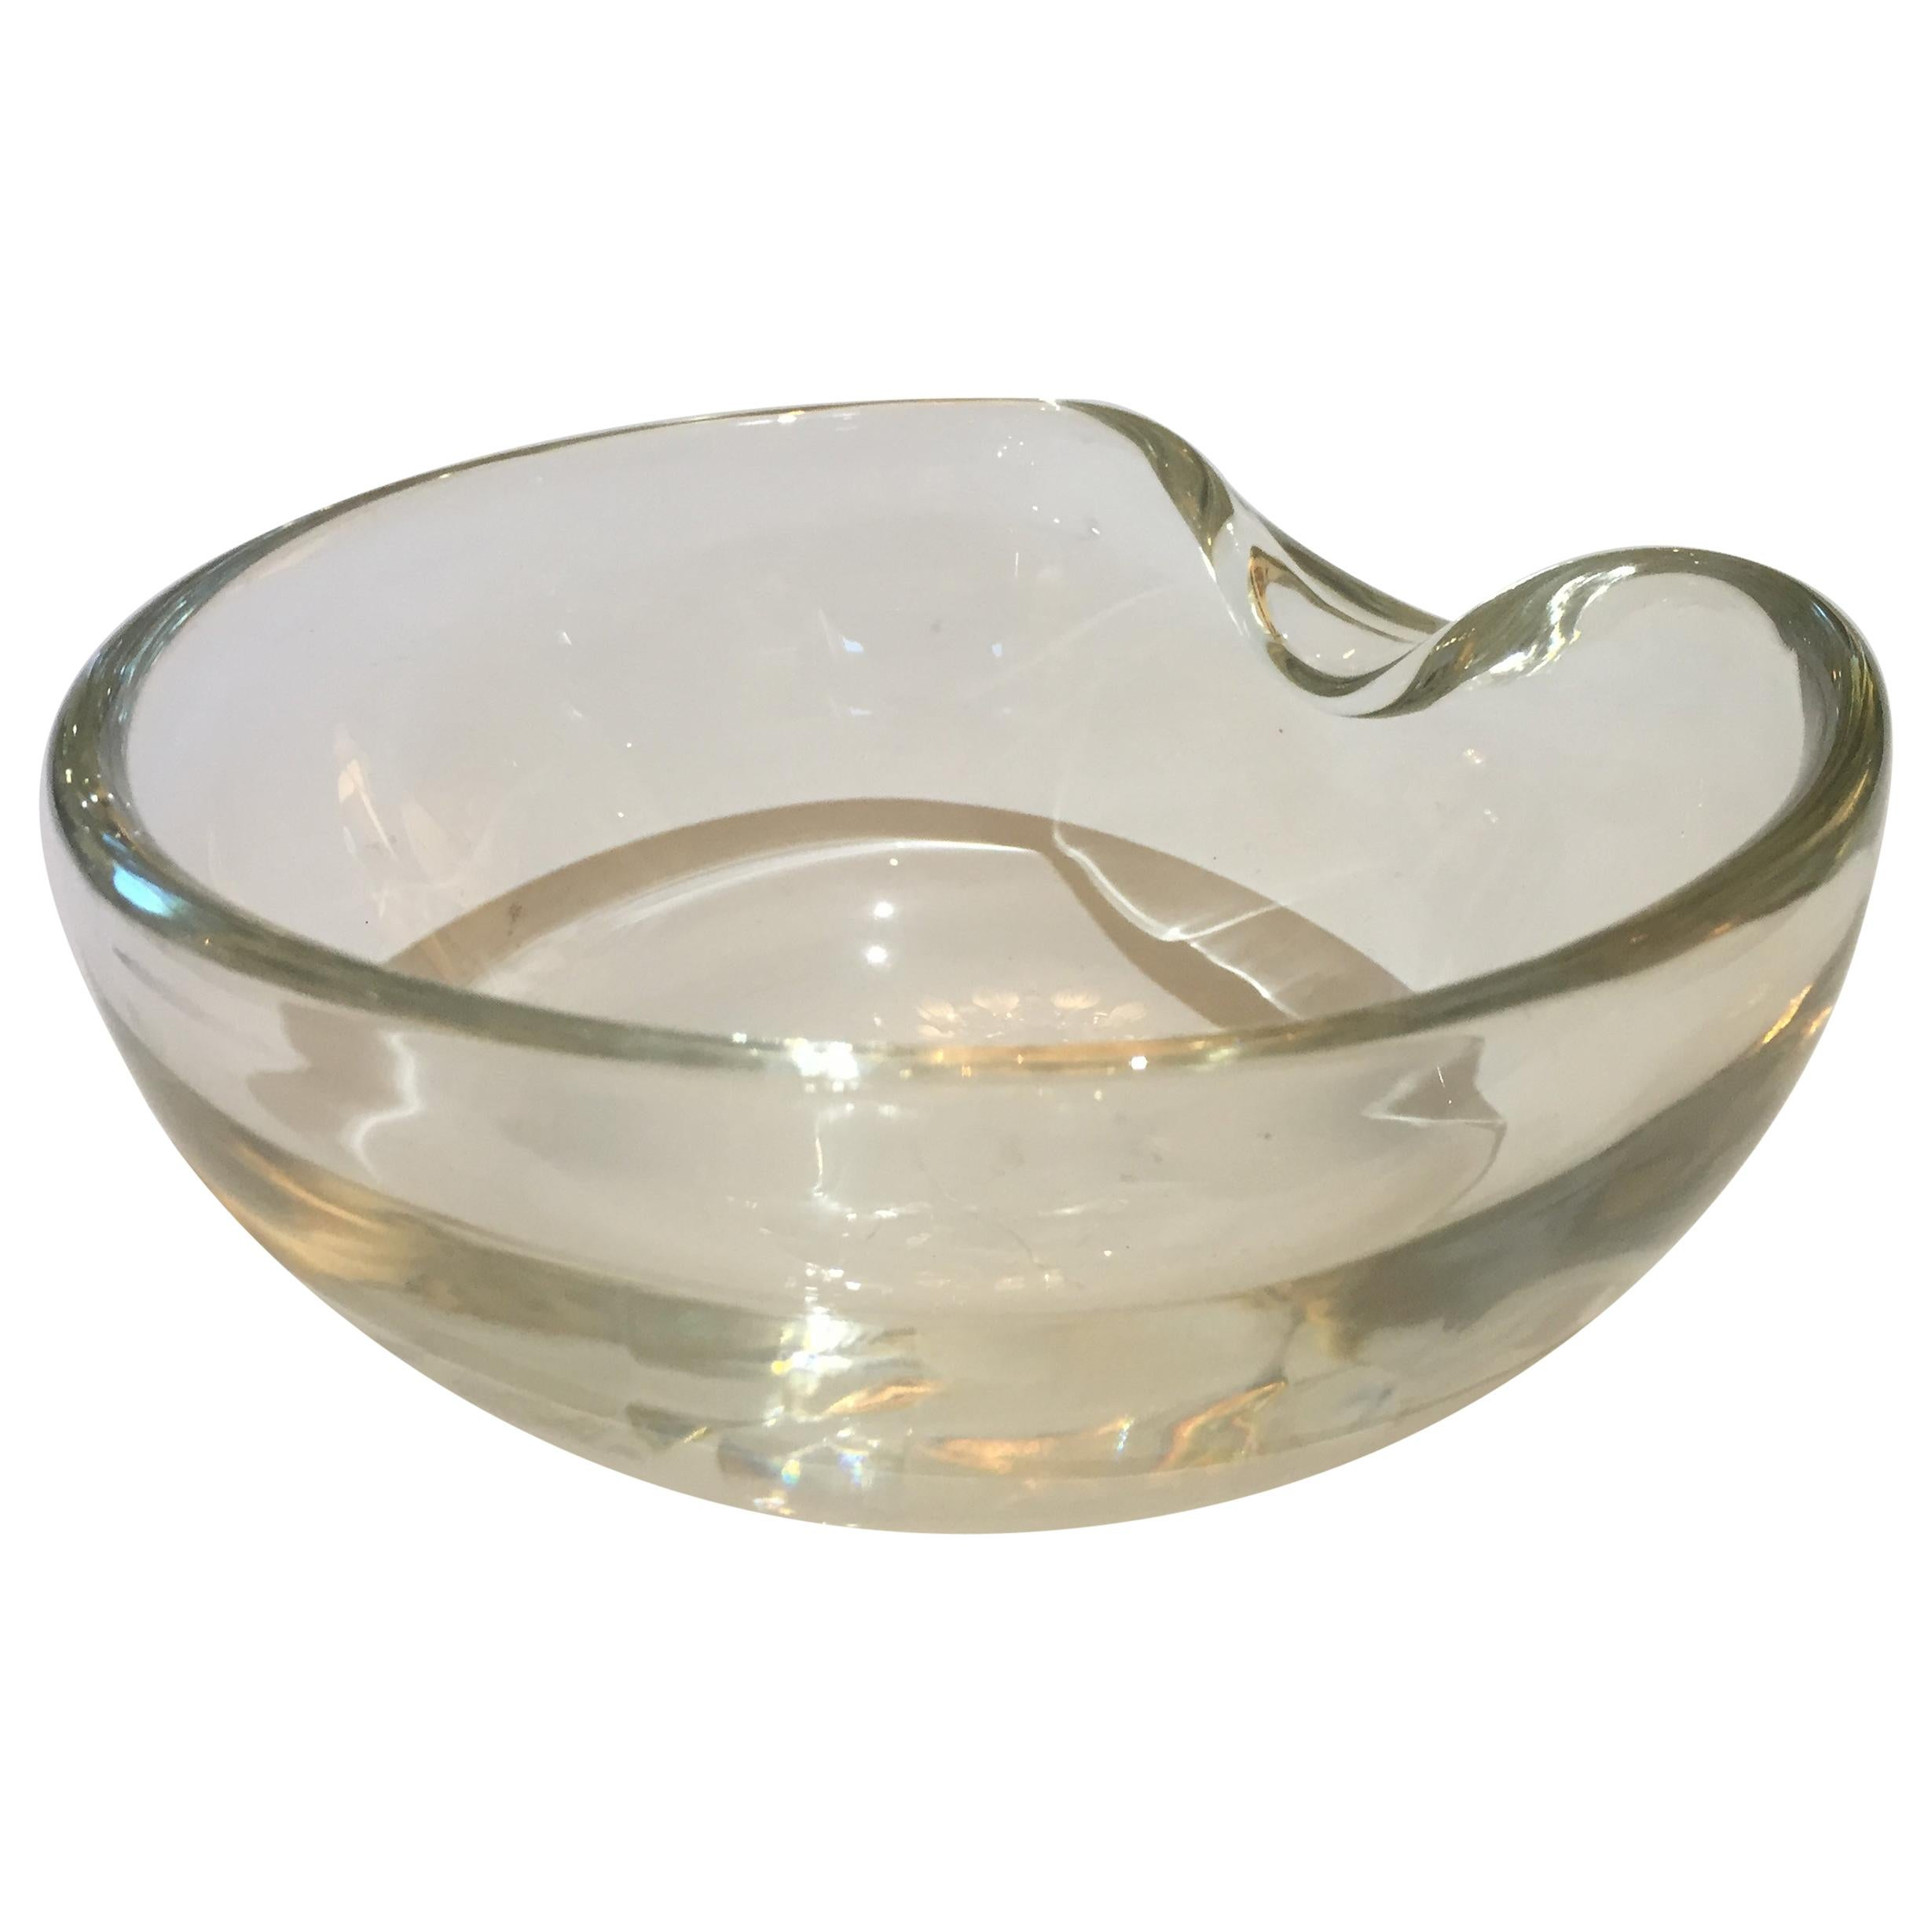 Elsa Peretti Thumbprint Bowl for Tiffany & Co. Clear Glass